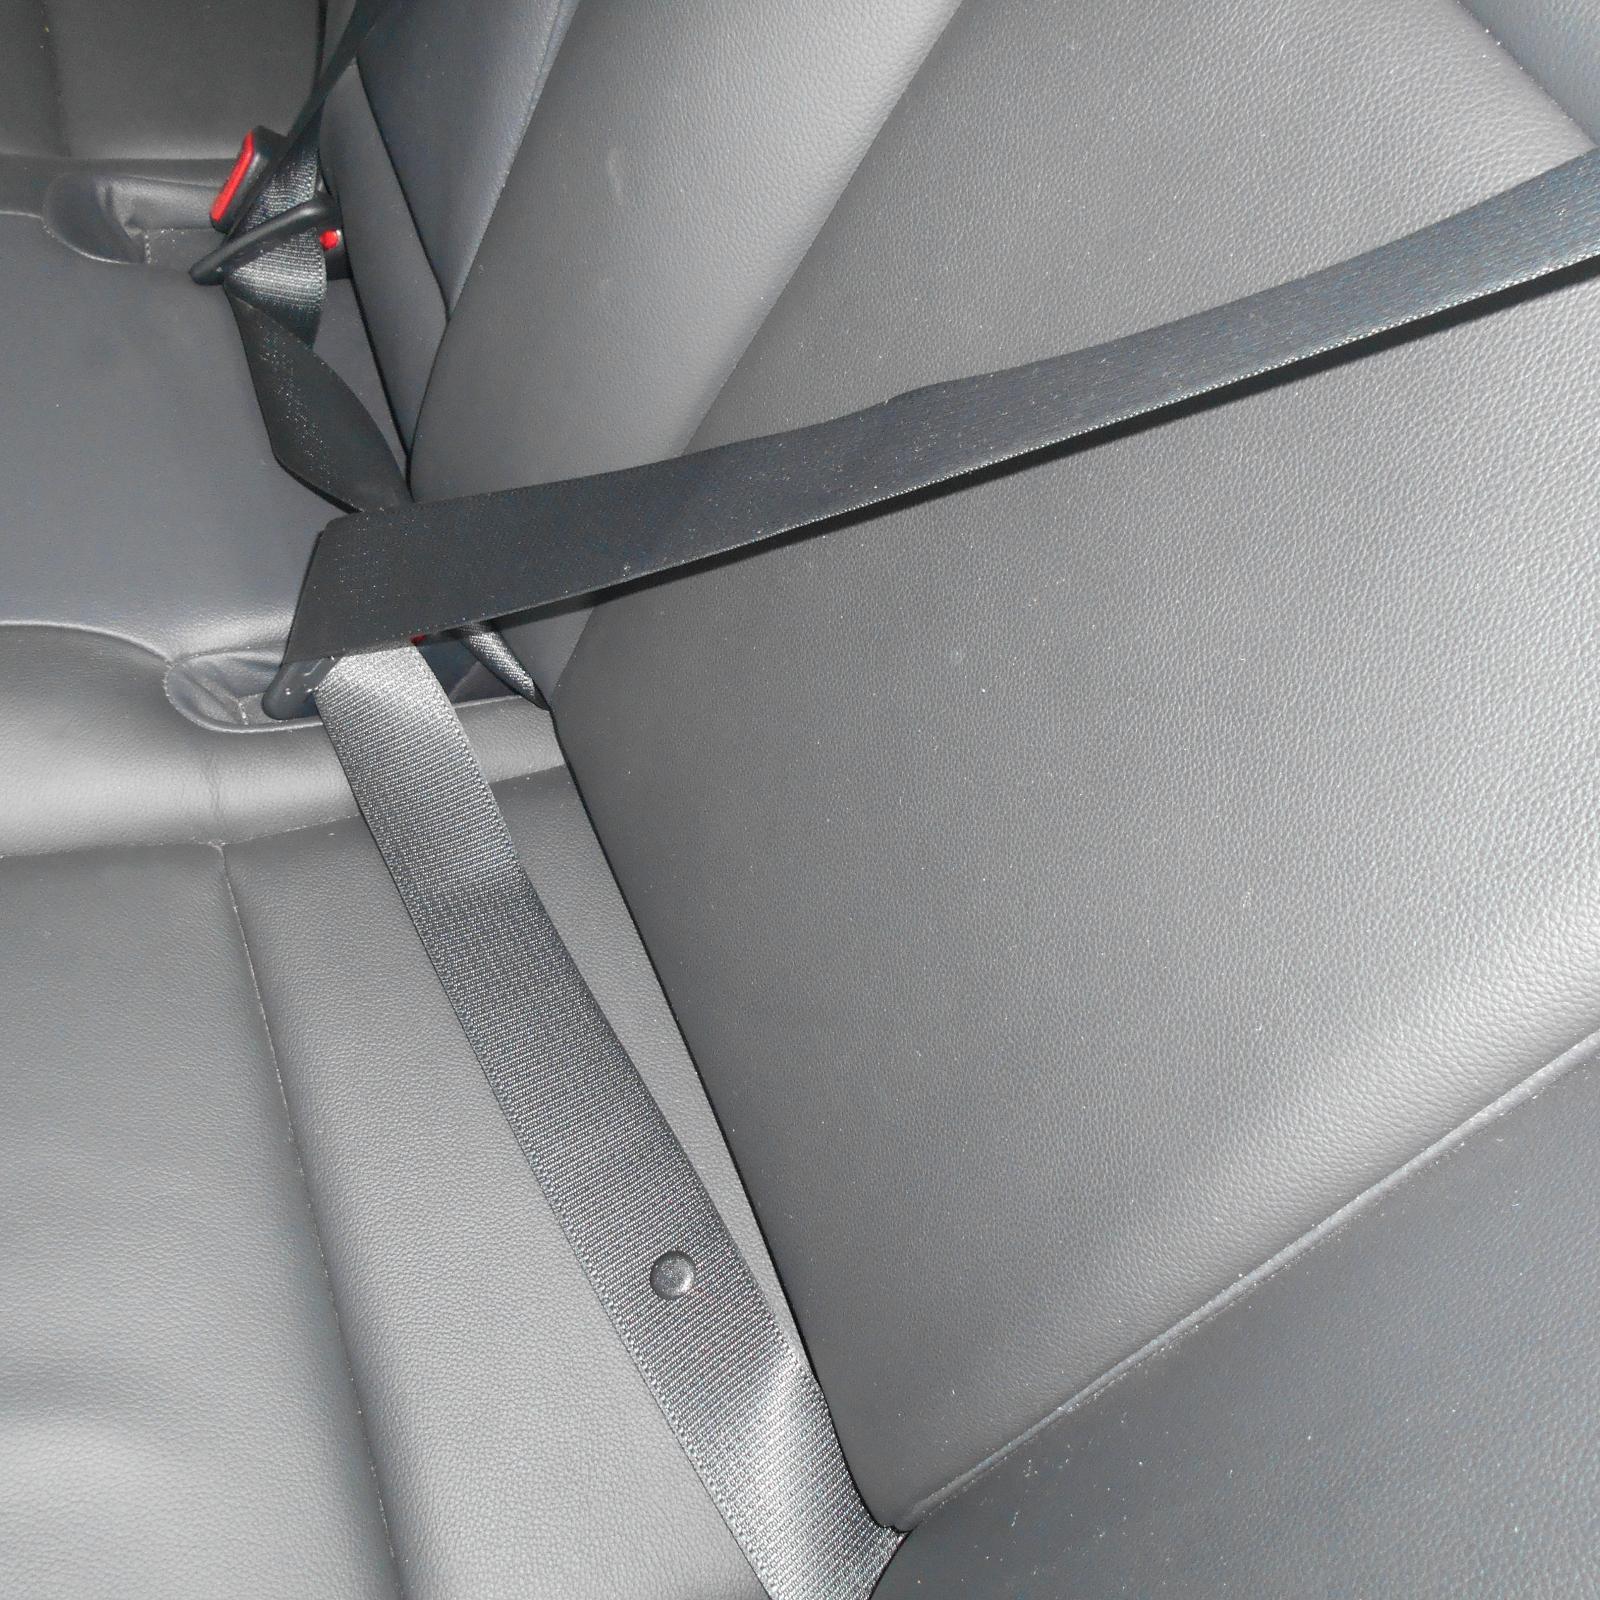 TOYOTA AURION, Seatbelt/Stalk, LH REAR, SEAT BELT STALK ONLY, GSV50R, 04/12-08/17